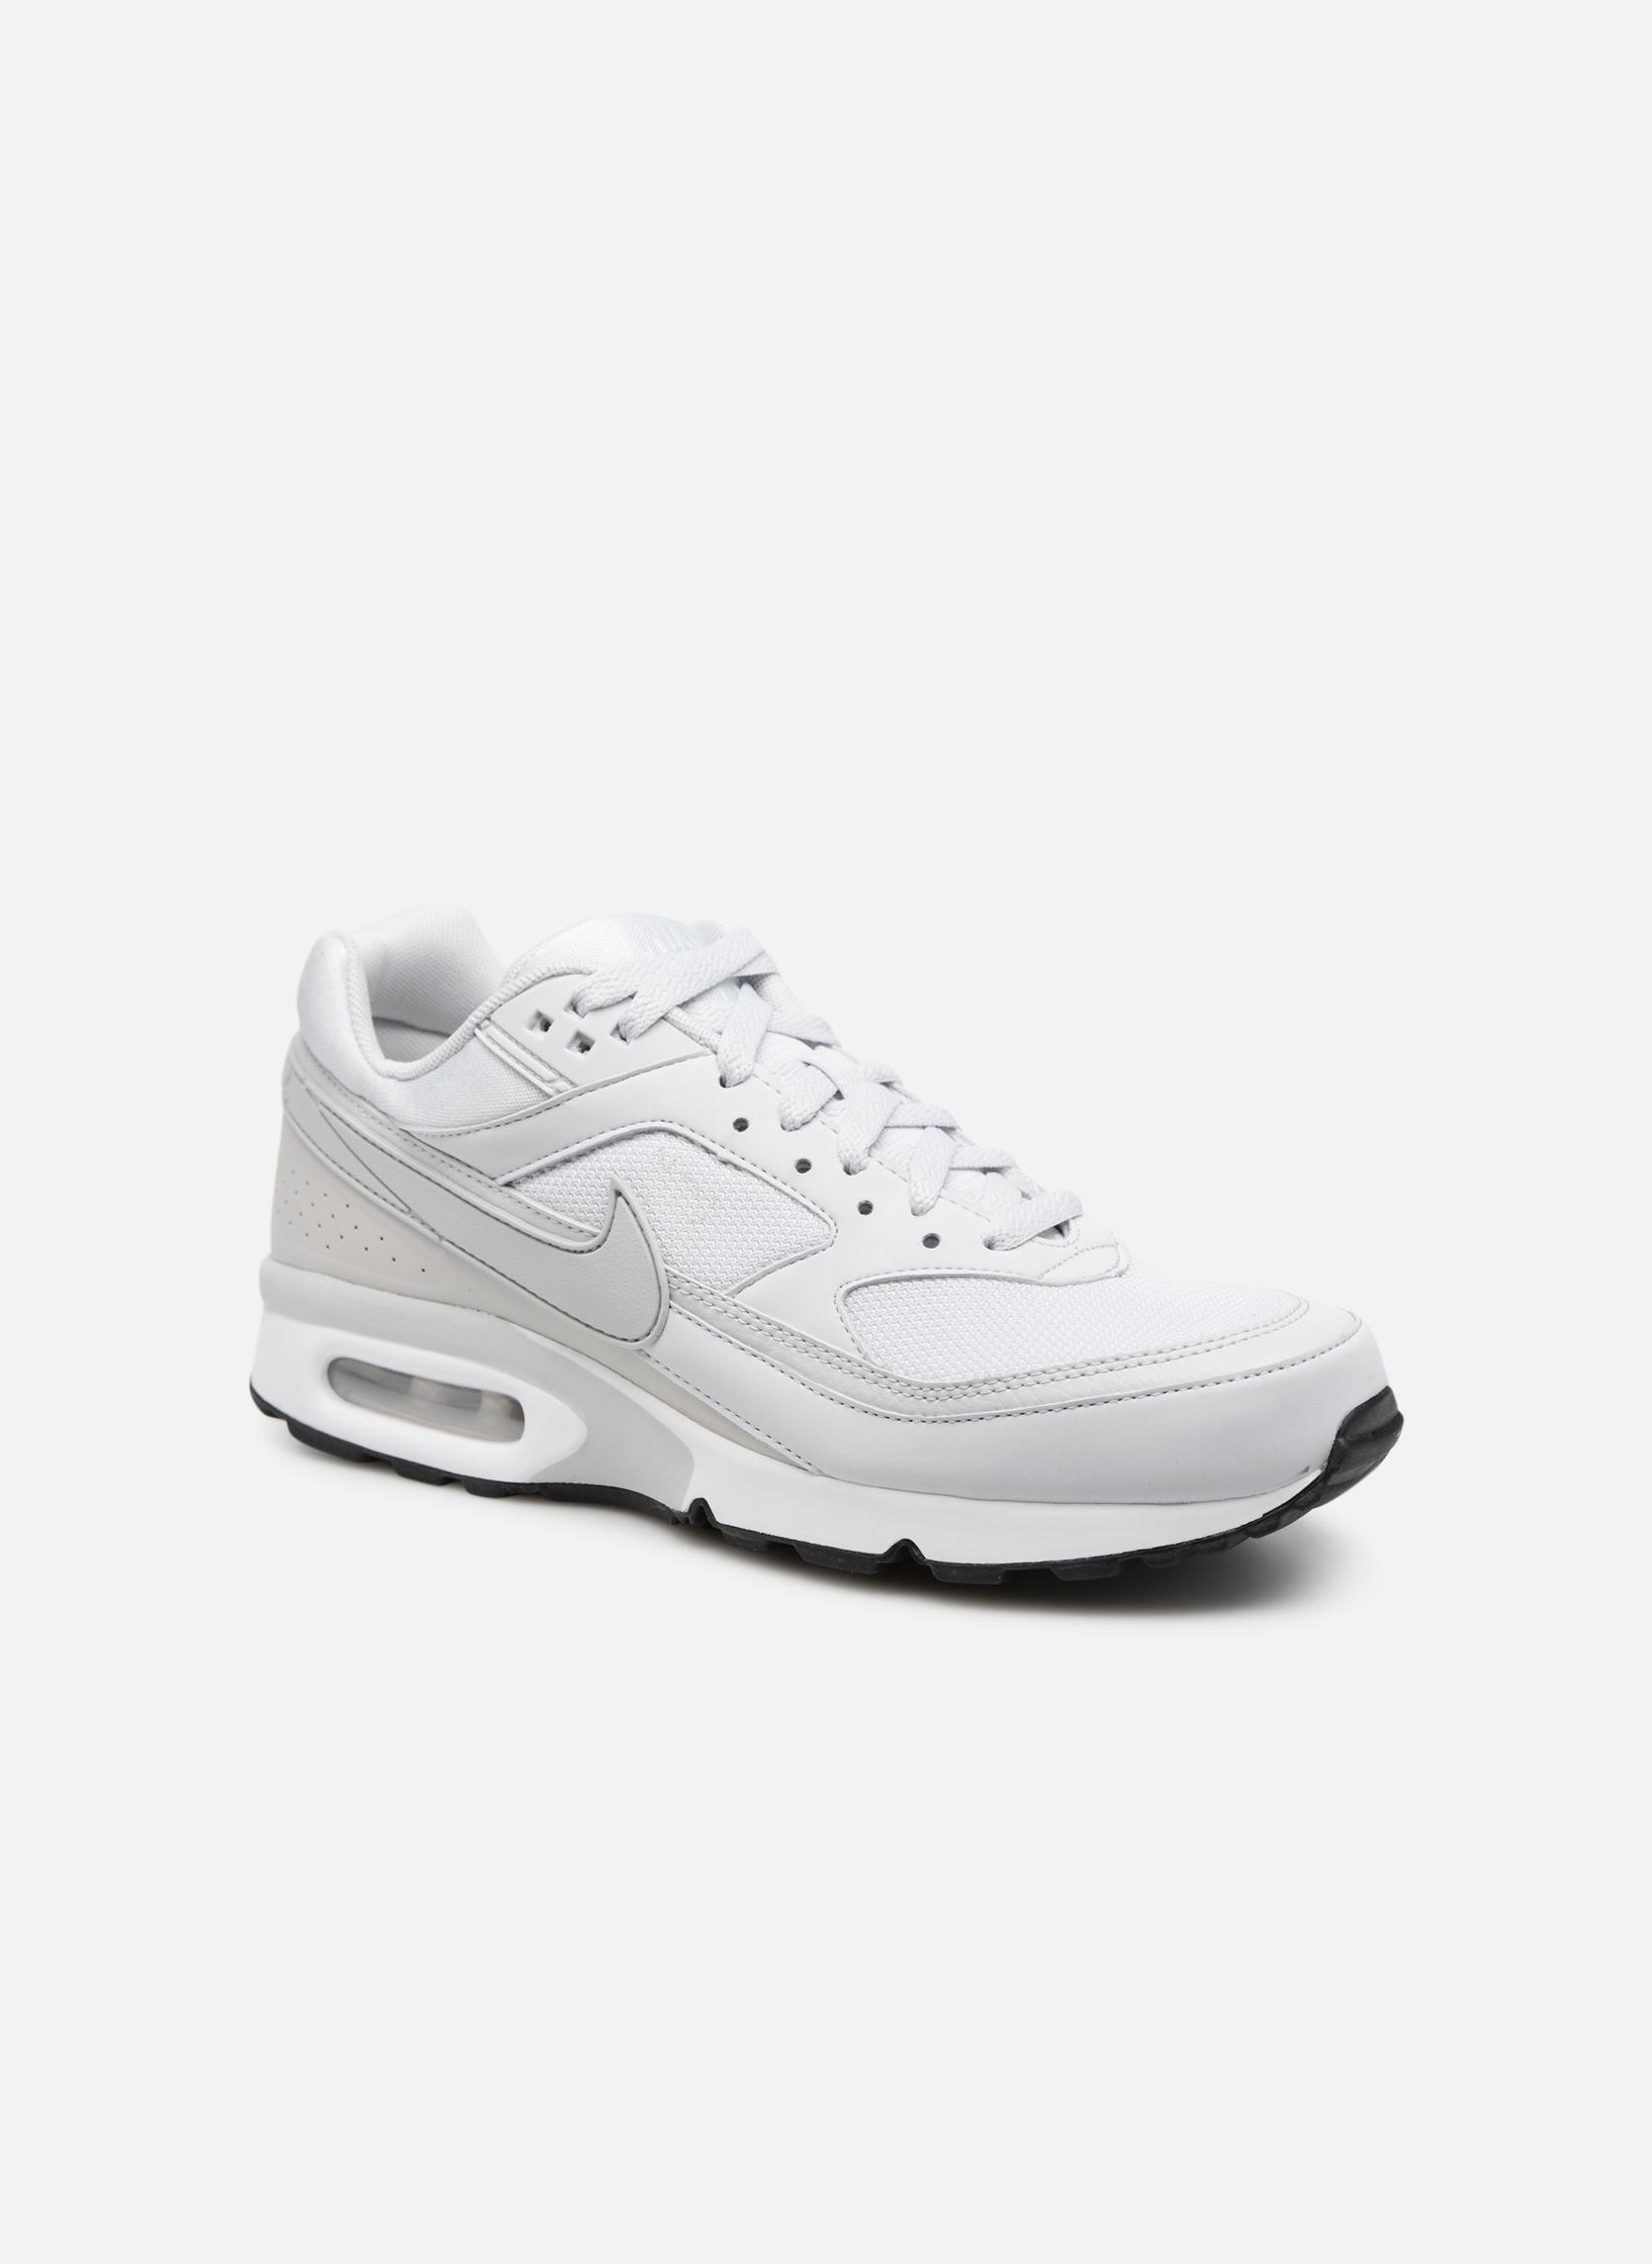 Nike Air Max Bw Pure Platinum/Pure Platinum-White-Black